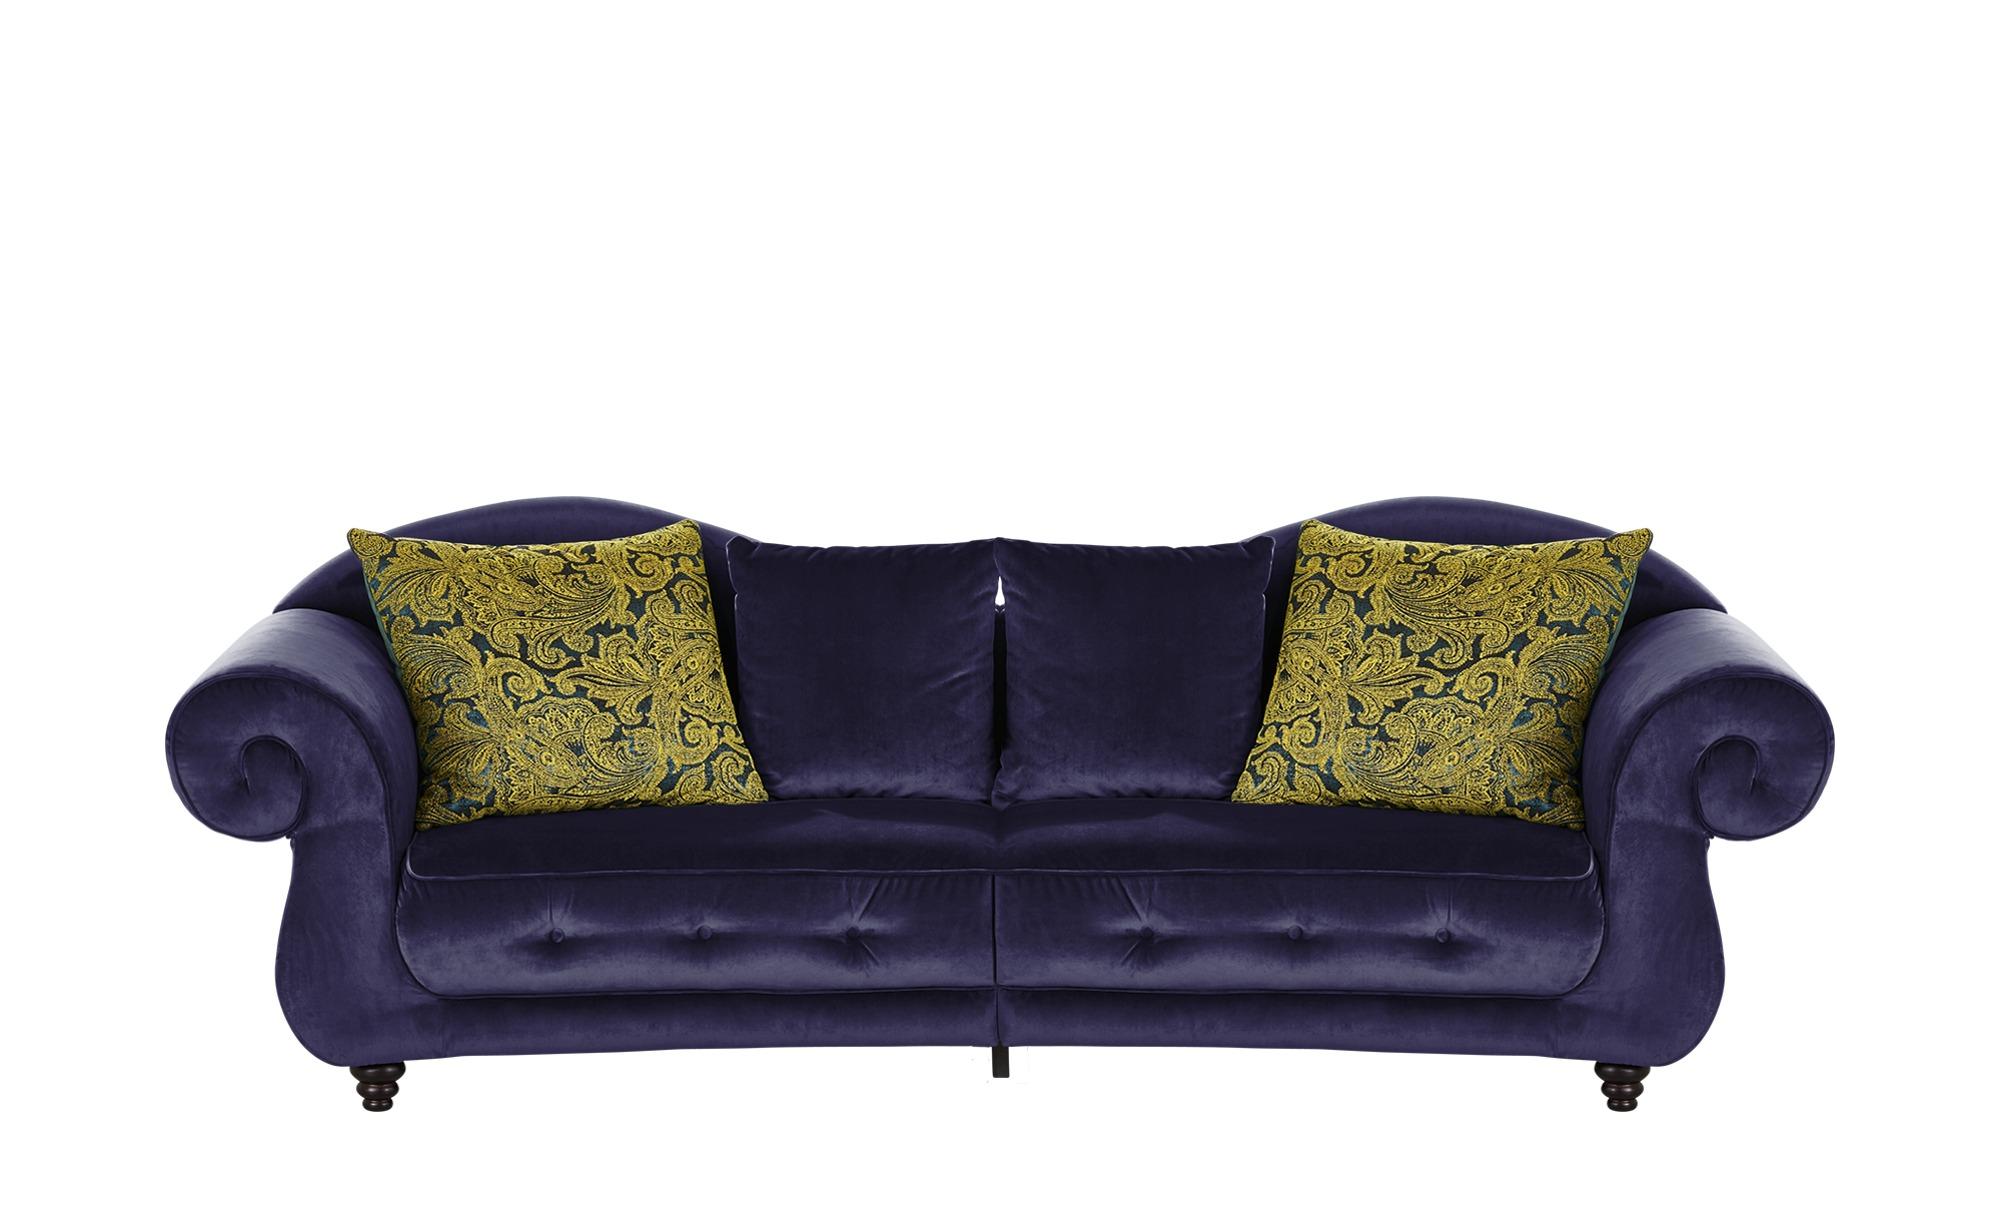 Design Big Sofa lila - Mikrofaser Nobody ¦ lila/violett ¦ Maße (cm): B: 288 H: 98 T: 110 Polstermöbel > Sofas > Big-Sofas - Höffner